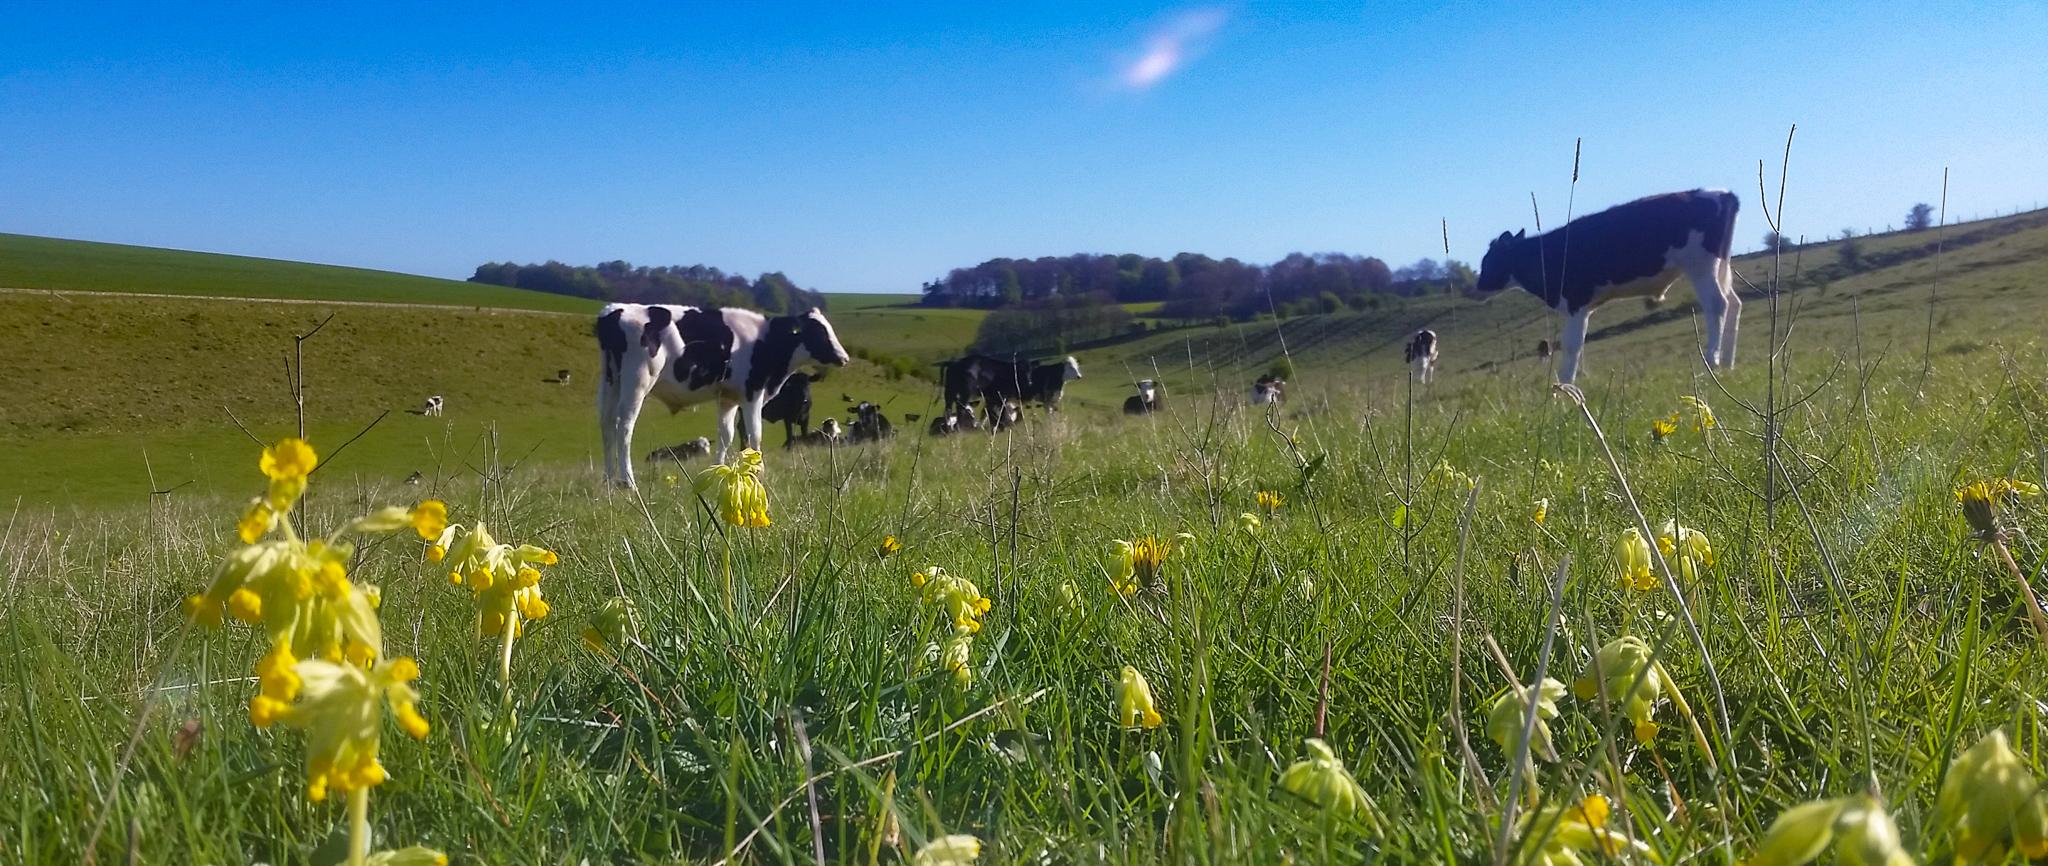 Pasture-fed livestock